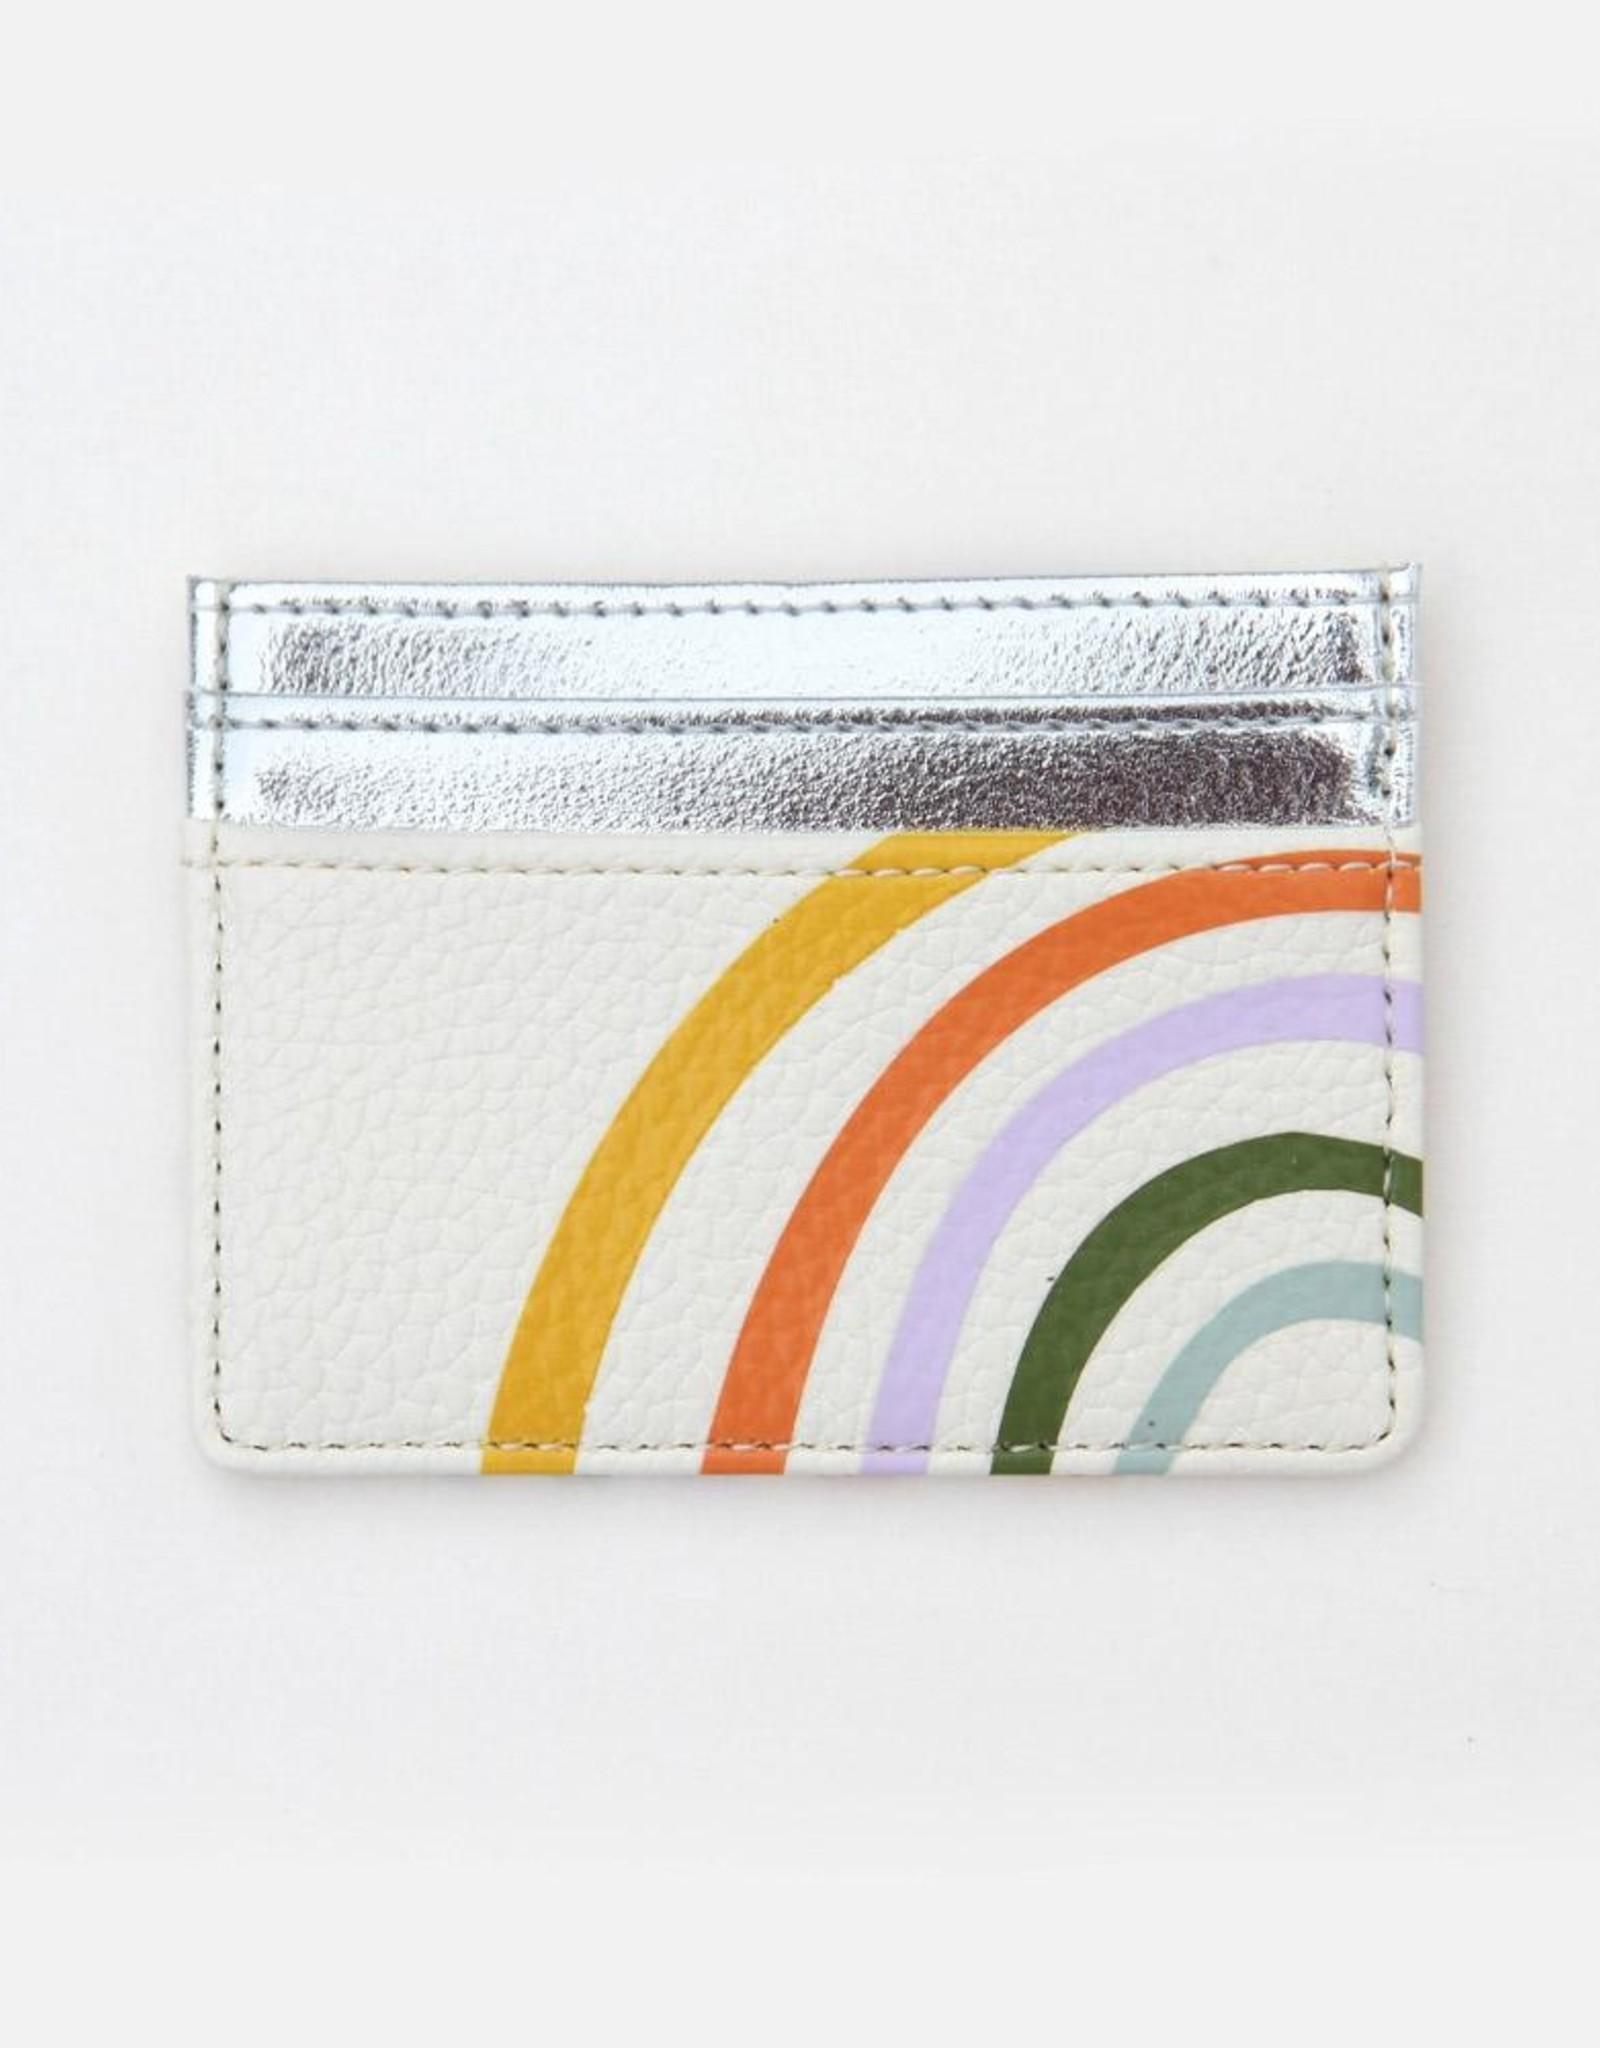 Caroline Gardener Wallet: Cardholder Rainbow